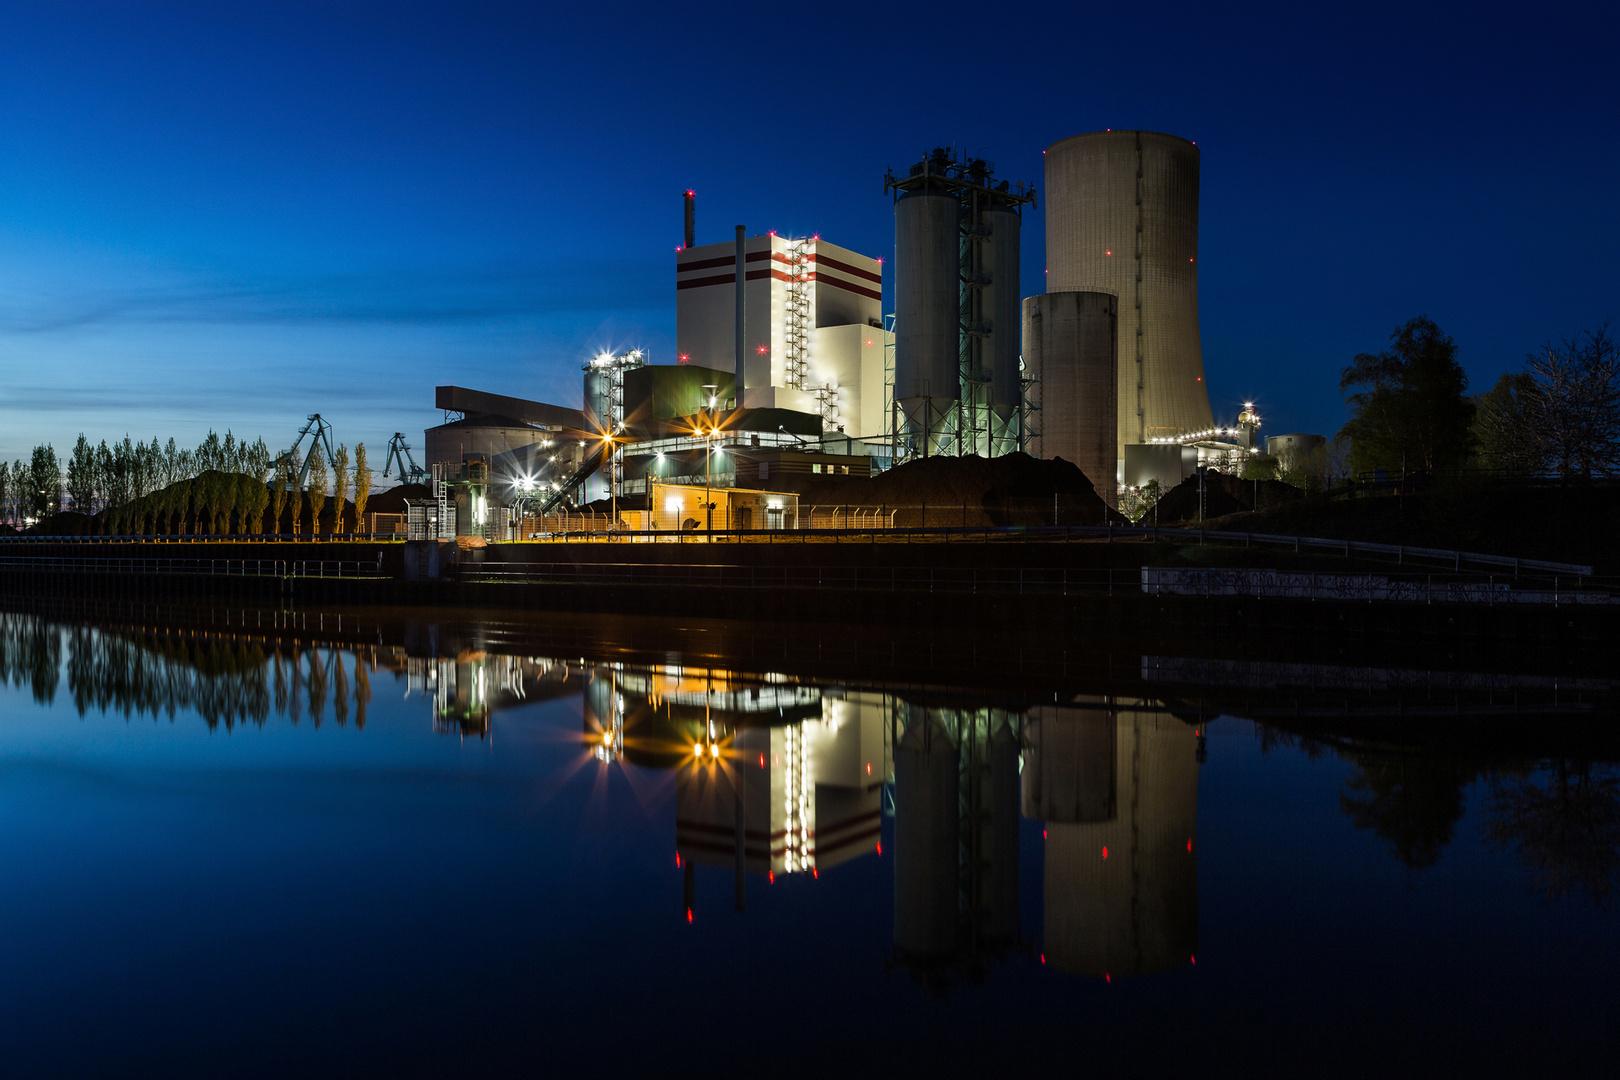 Trianel Kohlekraftwerk Lünen